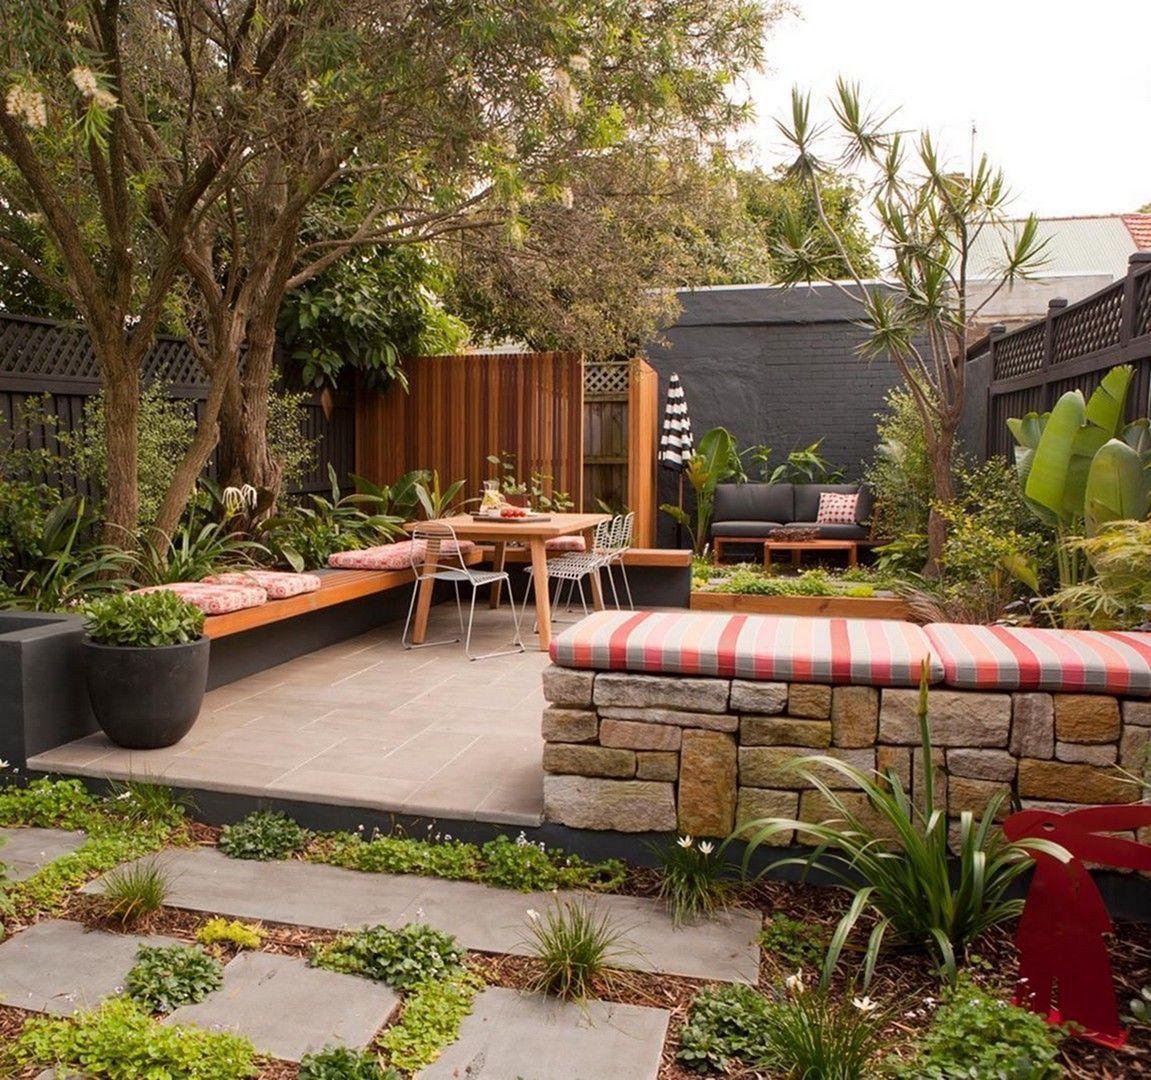 45 Gorgeous Small Garden Design With Low Cost Monthly Maintenance Backyard Garden Design Backyard Small Garden Design